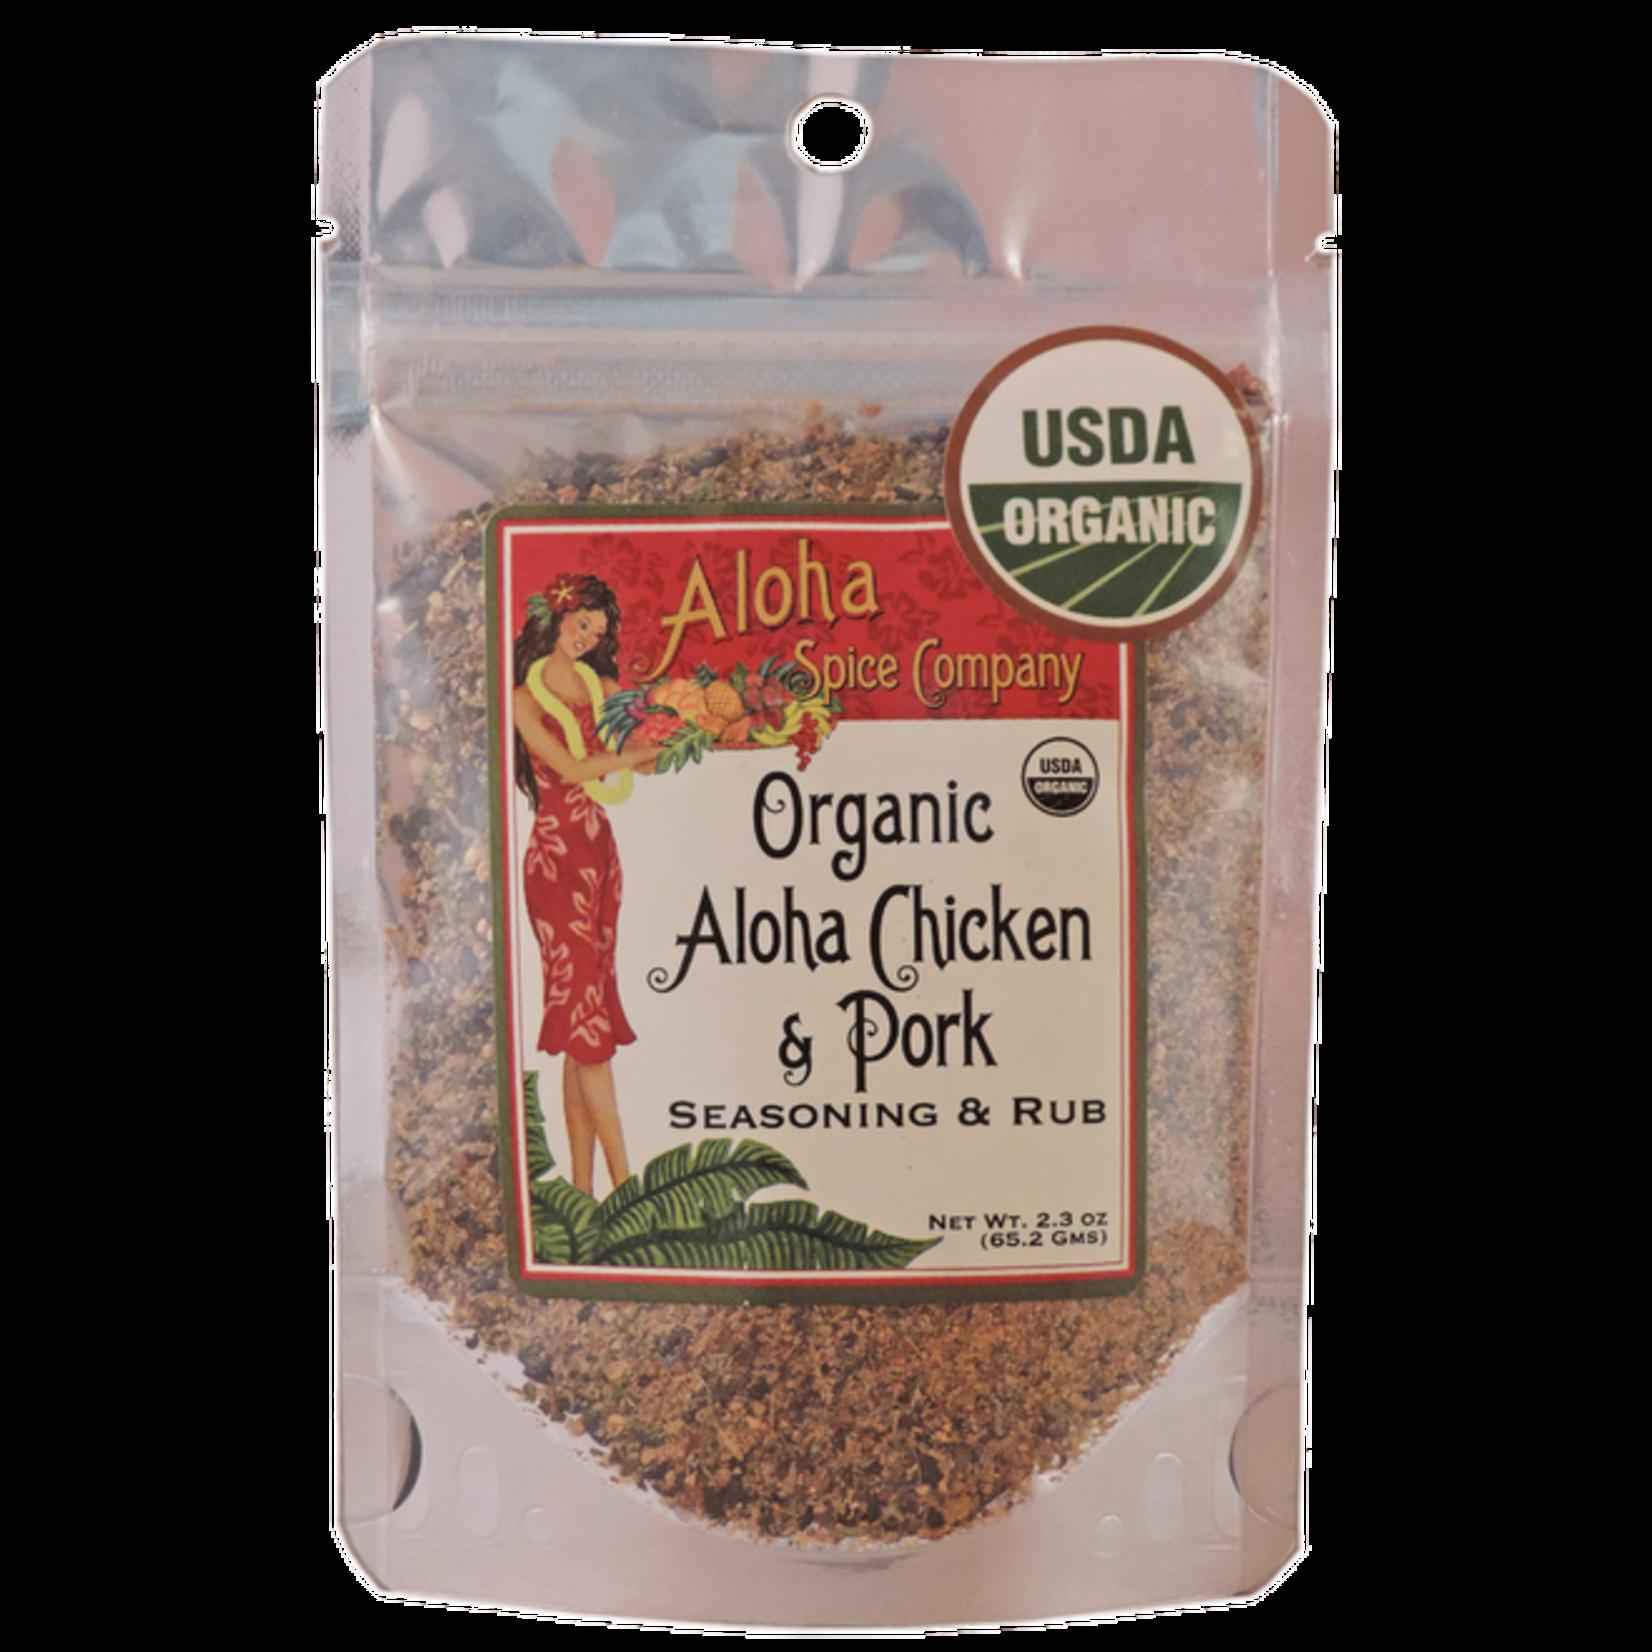 Aloha Spice Co. Organic Aloha Chicken & Pork Rub Bag